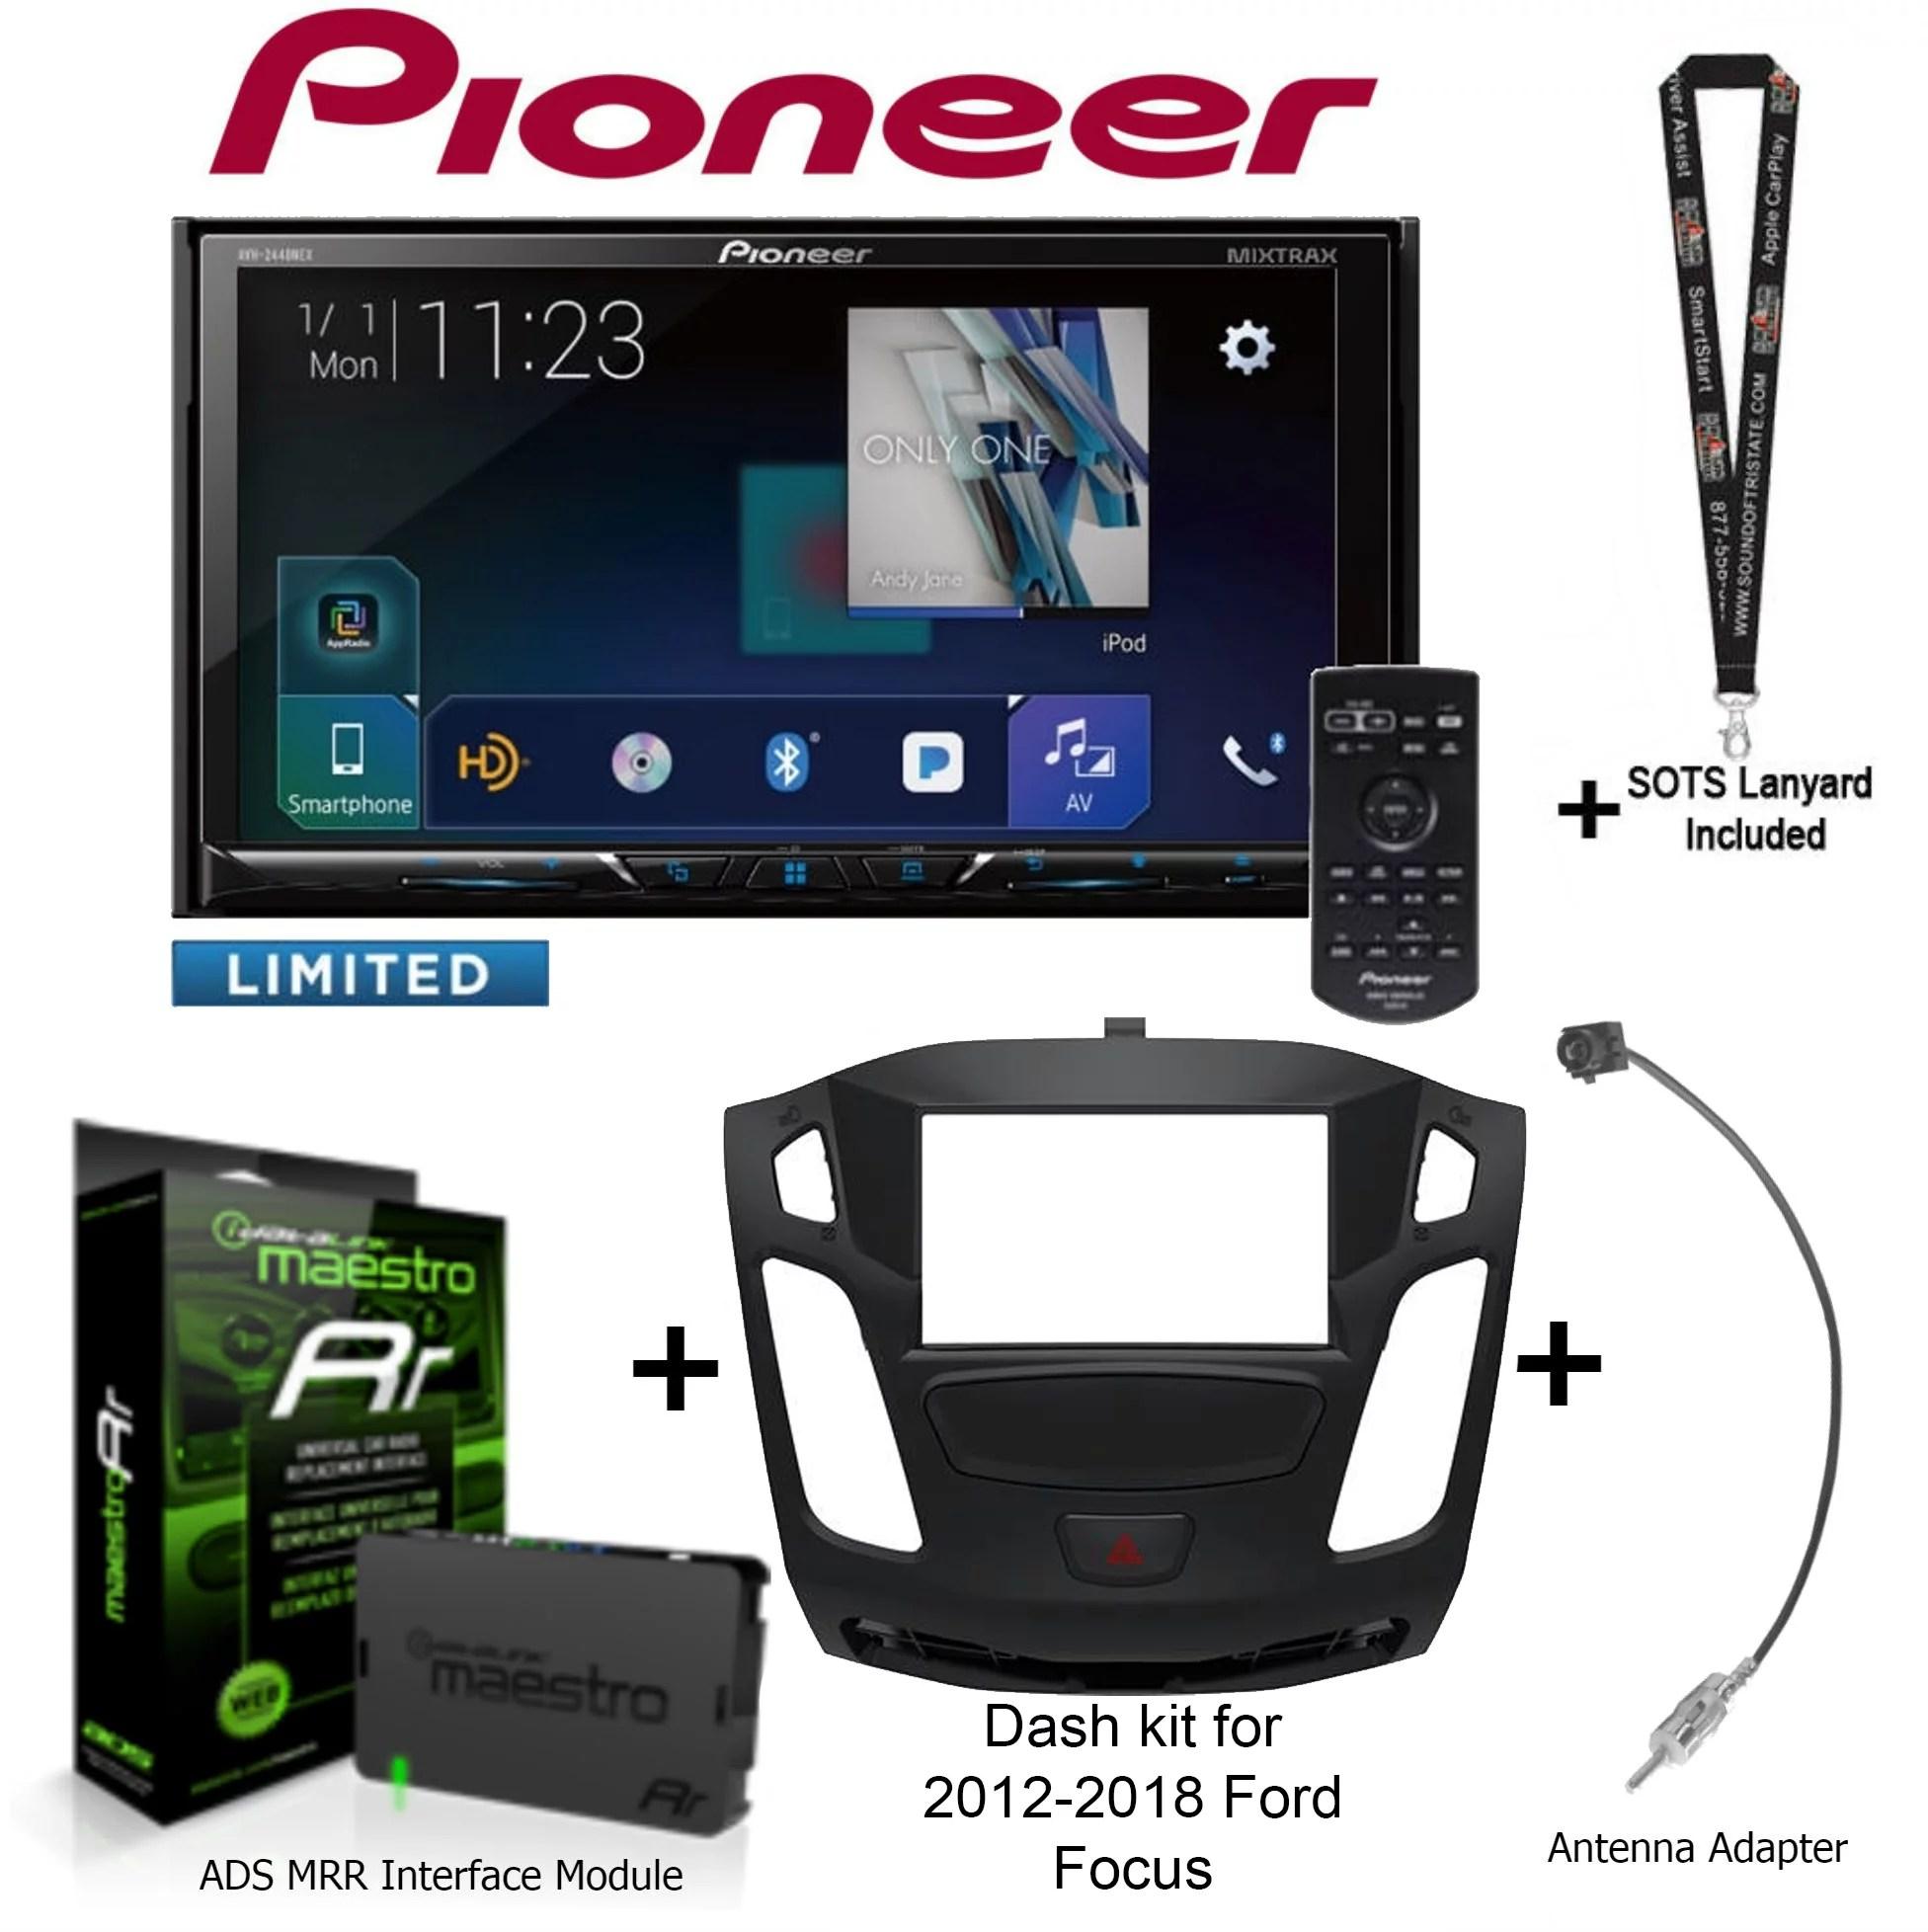 hight resolution of pioneer avh 2440nex 7 dvd receiver idatalink maestro kit foc1 dash kit